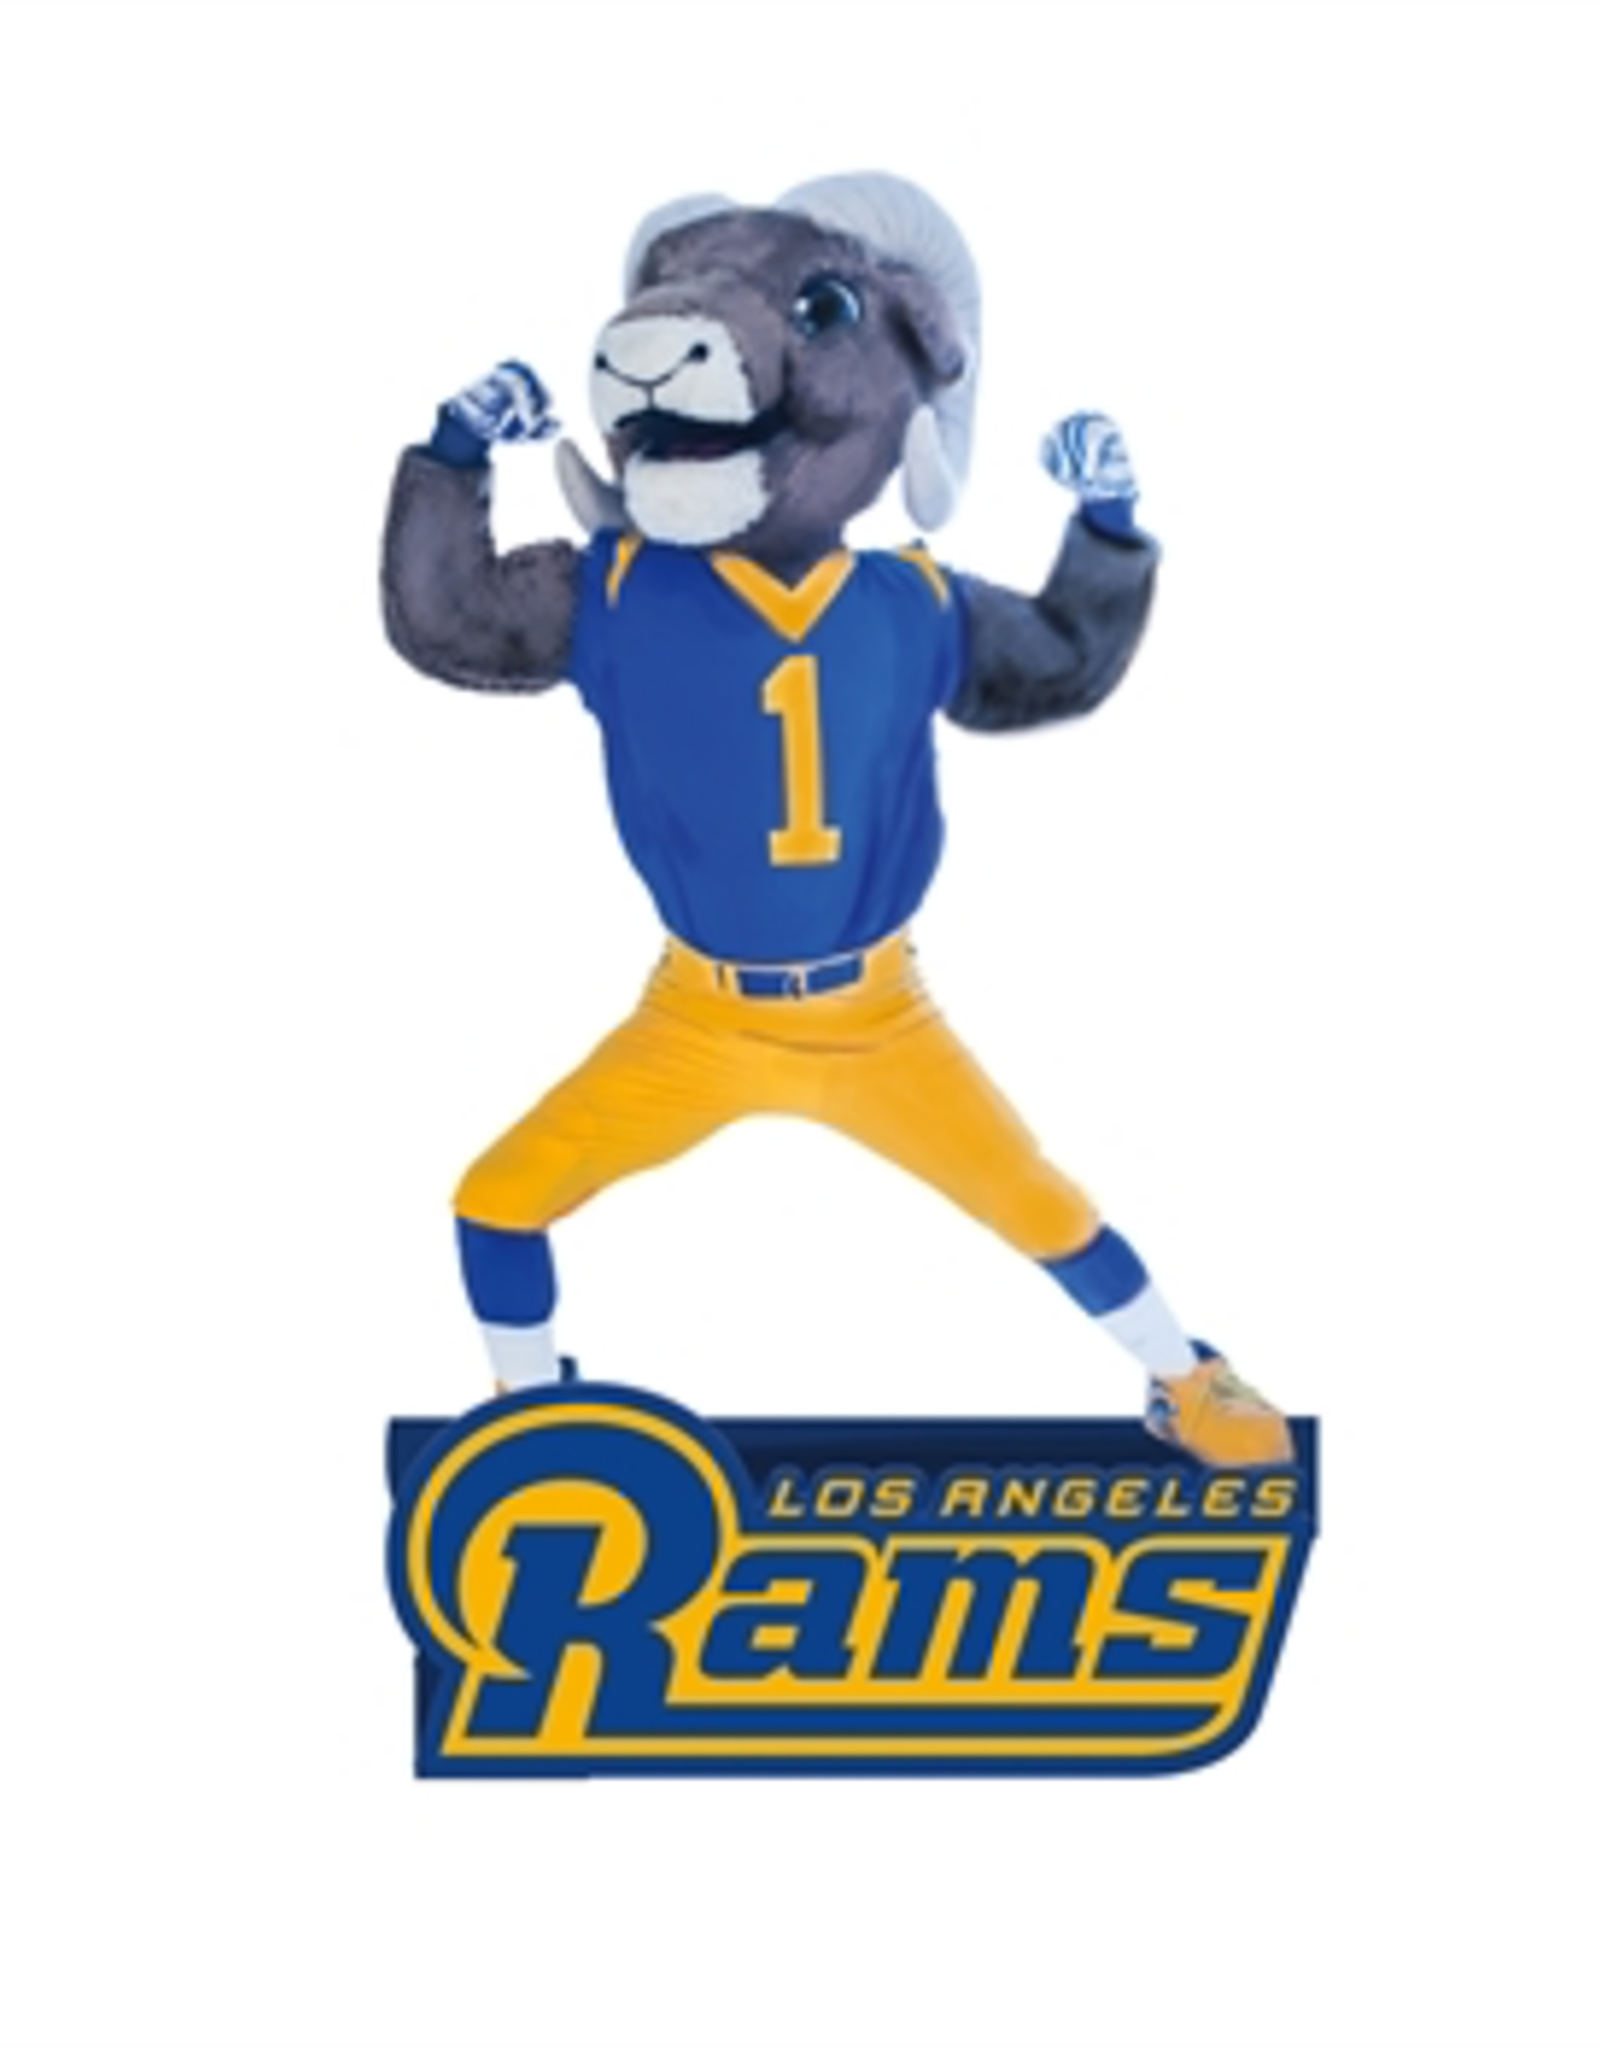 EVERGREEN Los Angeles Rams Mascot Statue